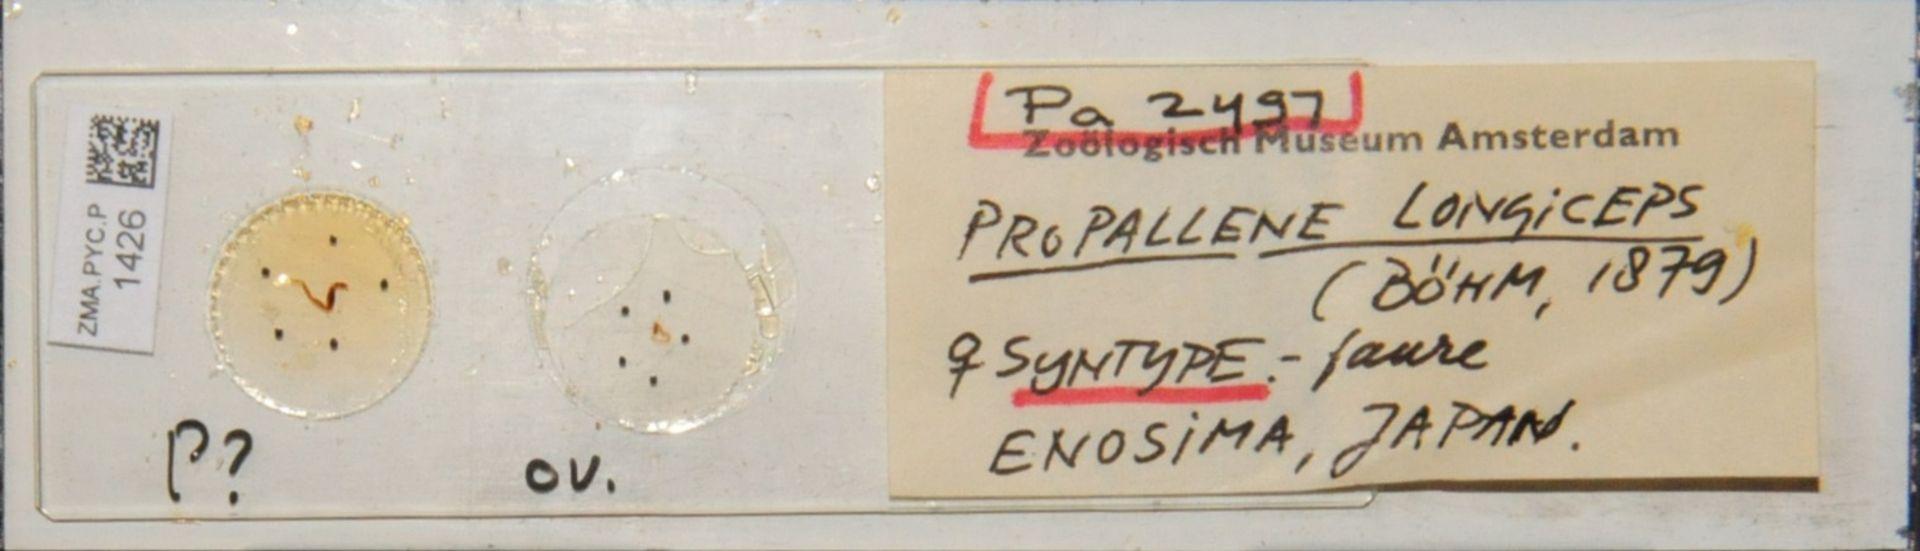 ZMA.PYC.P.1426 | Propallene longiceps (Böhm, 1879)